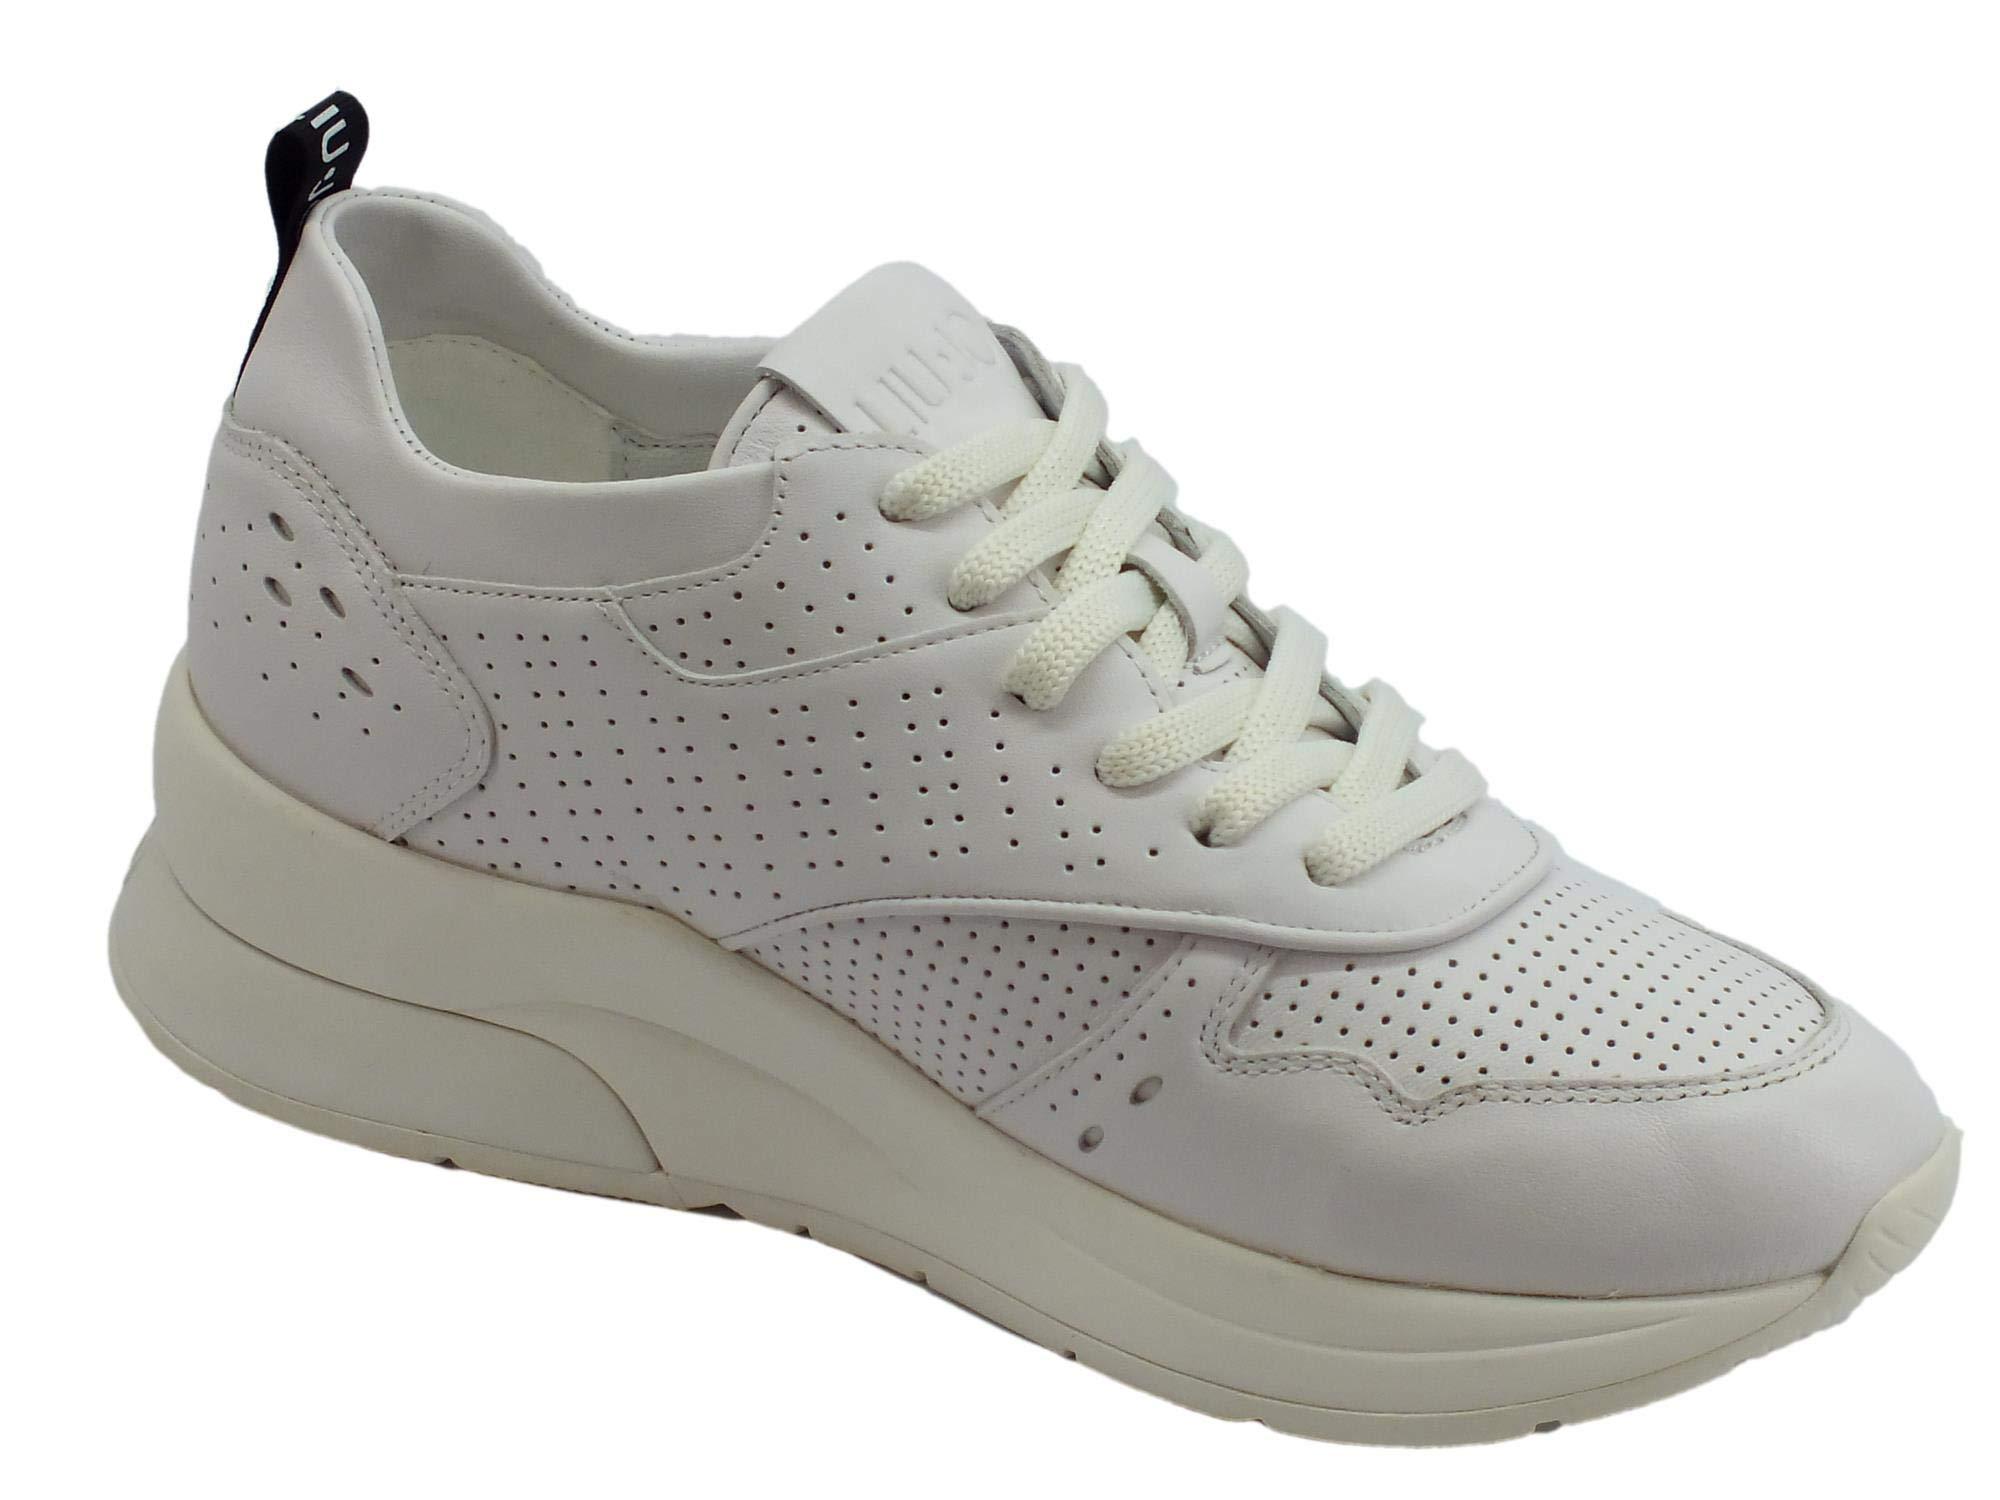 Liu Jo Jeans Karlie 14 Sneaker Calf Leather White, Scarpe da